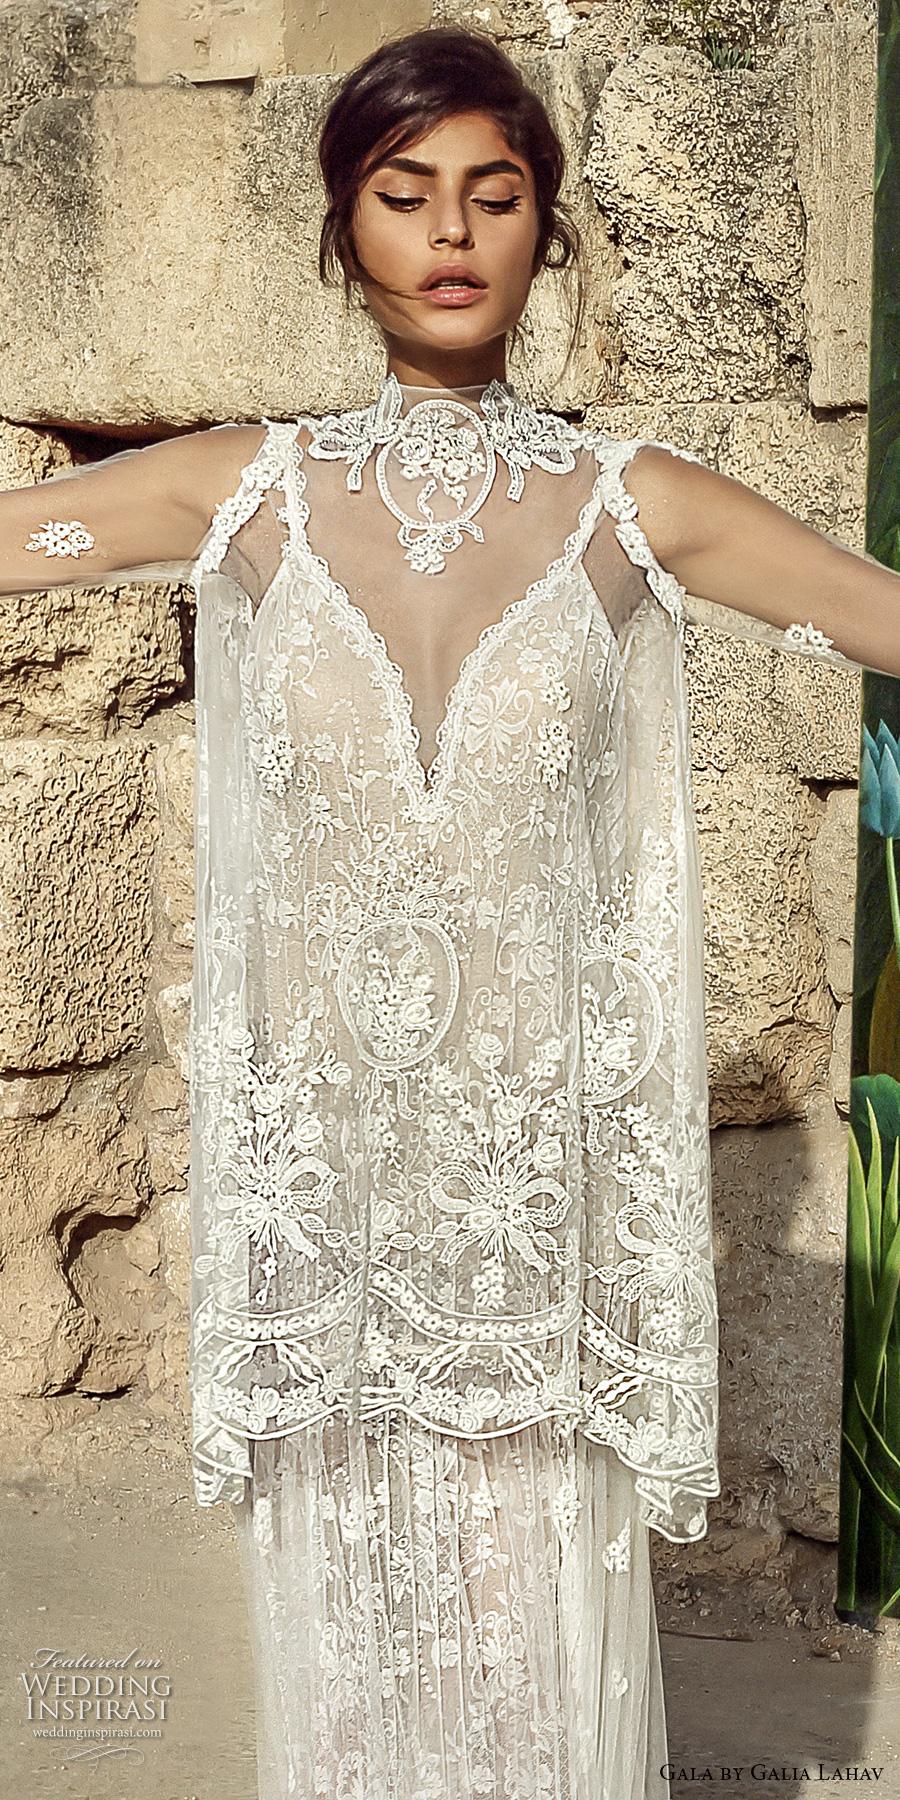 Gala by galia lahav 2017 wedding dresses crazyforus for Long sleeve wedding dress topper